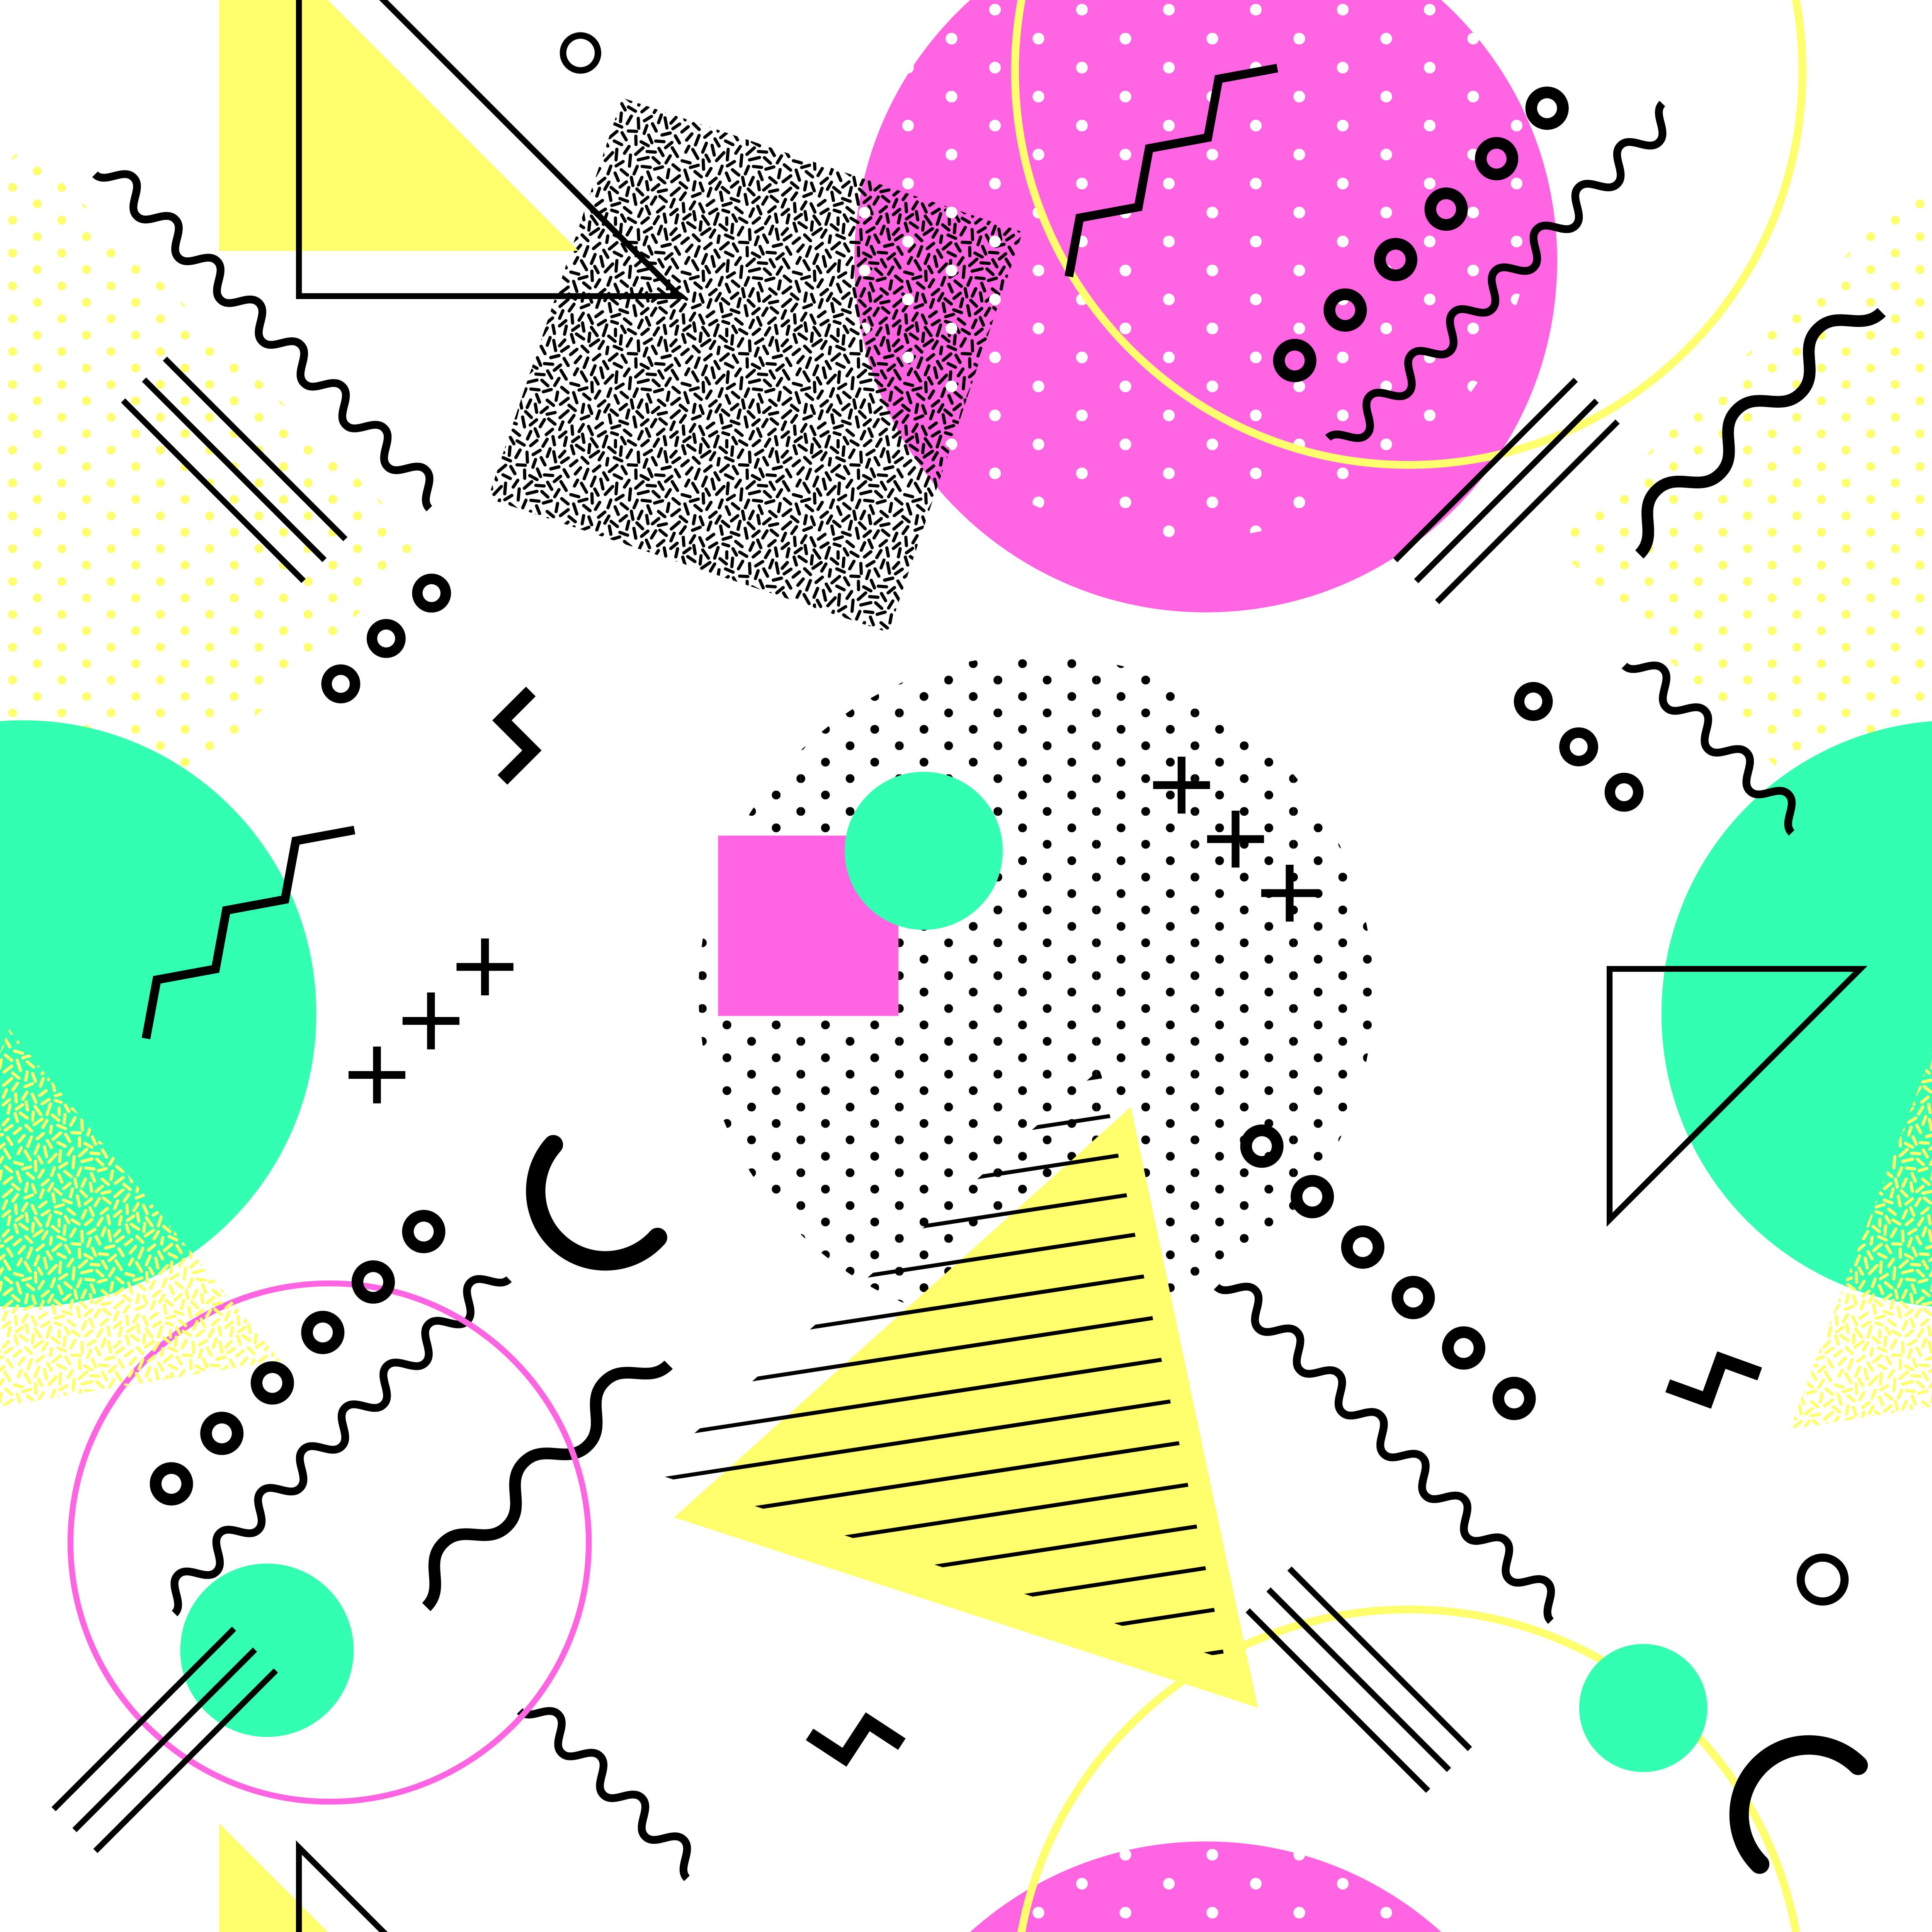 memphis seamless pattern colorful